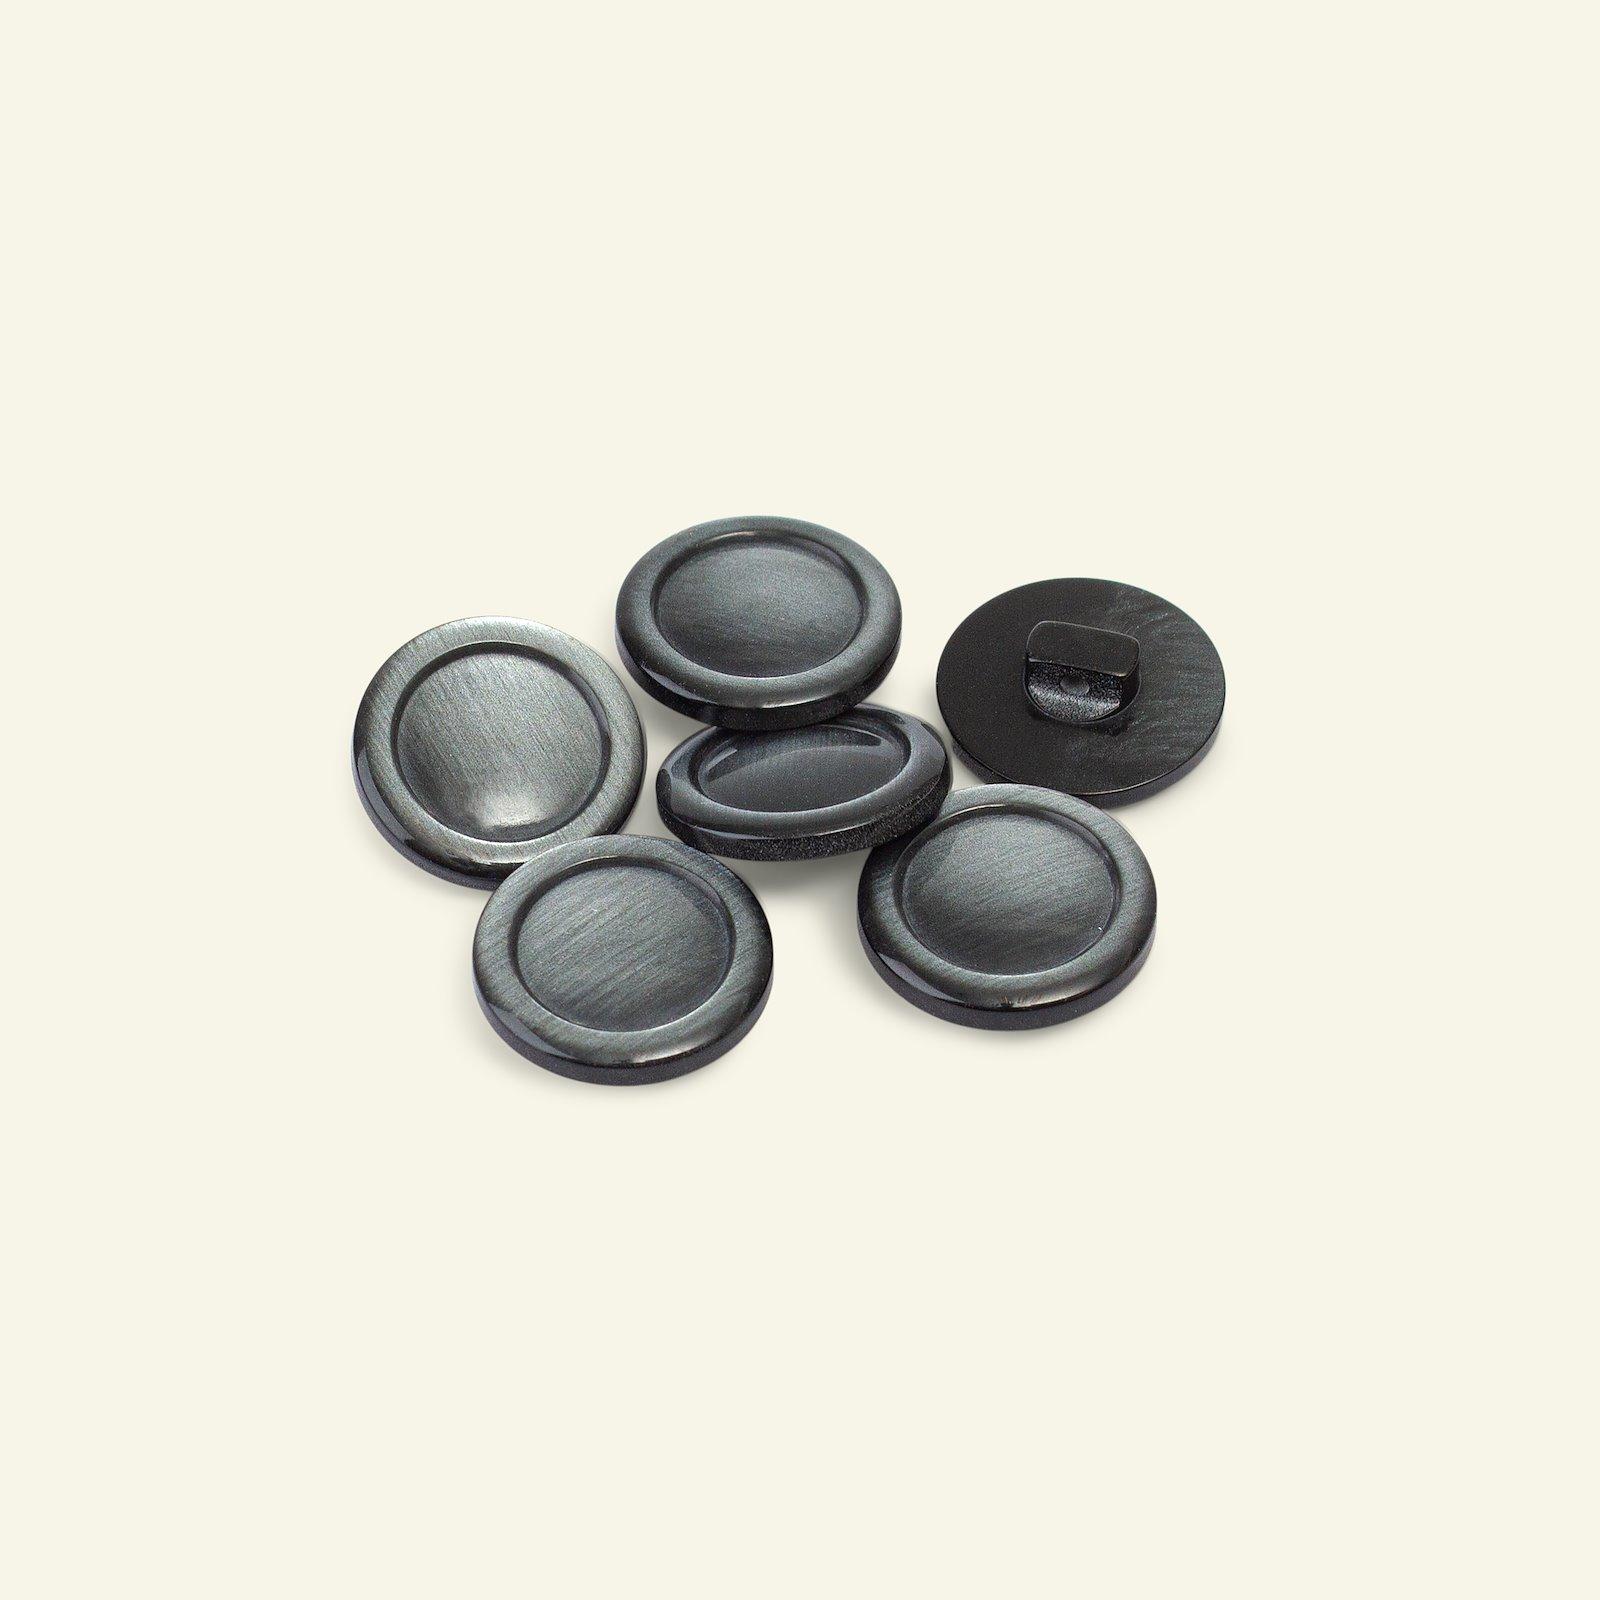 Shank button w/rim 20mm grey 6pcs 33194_pack